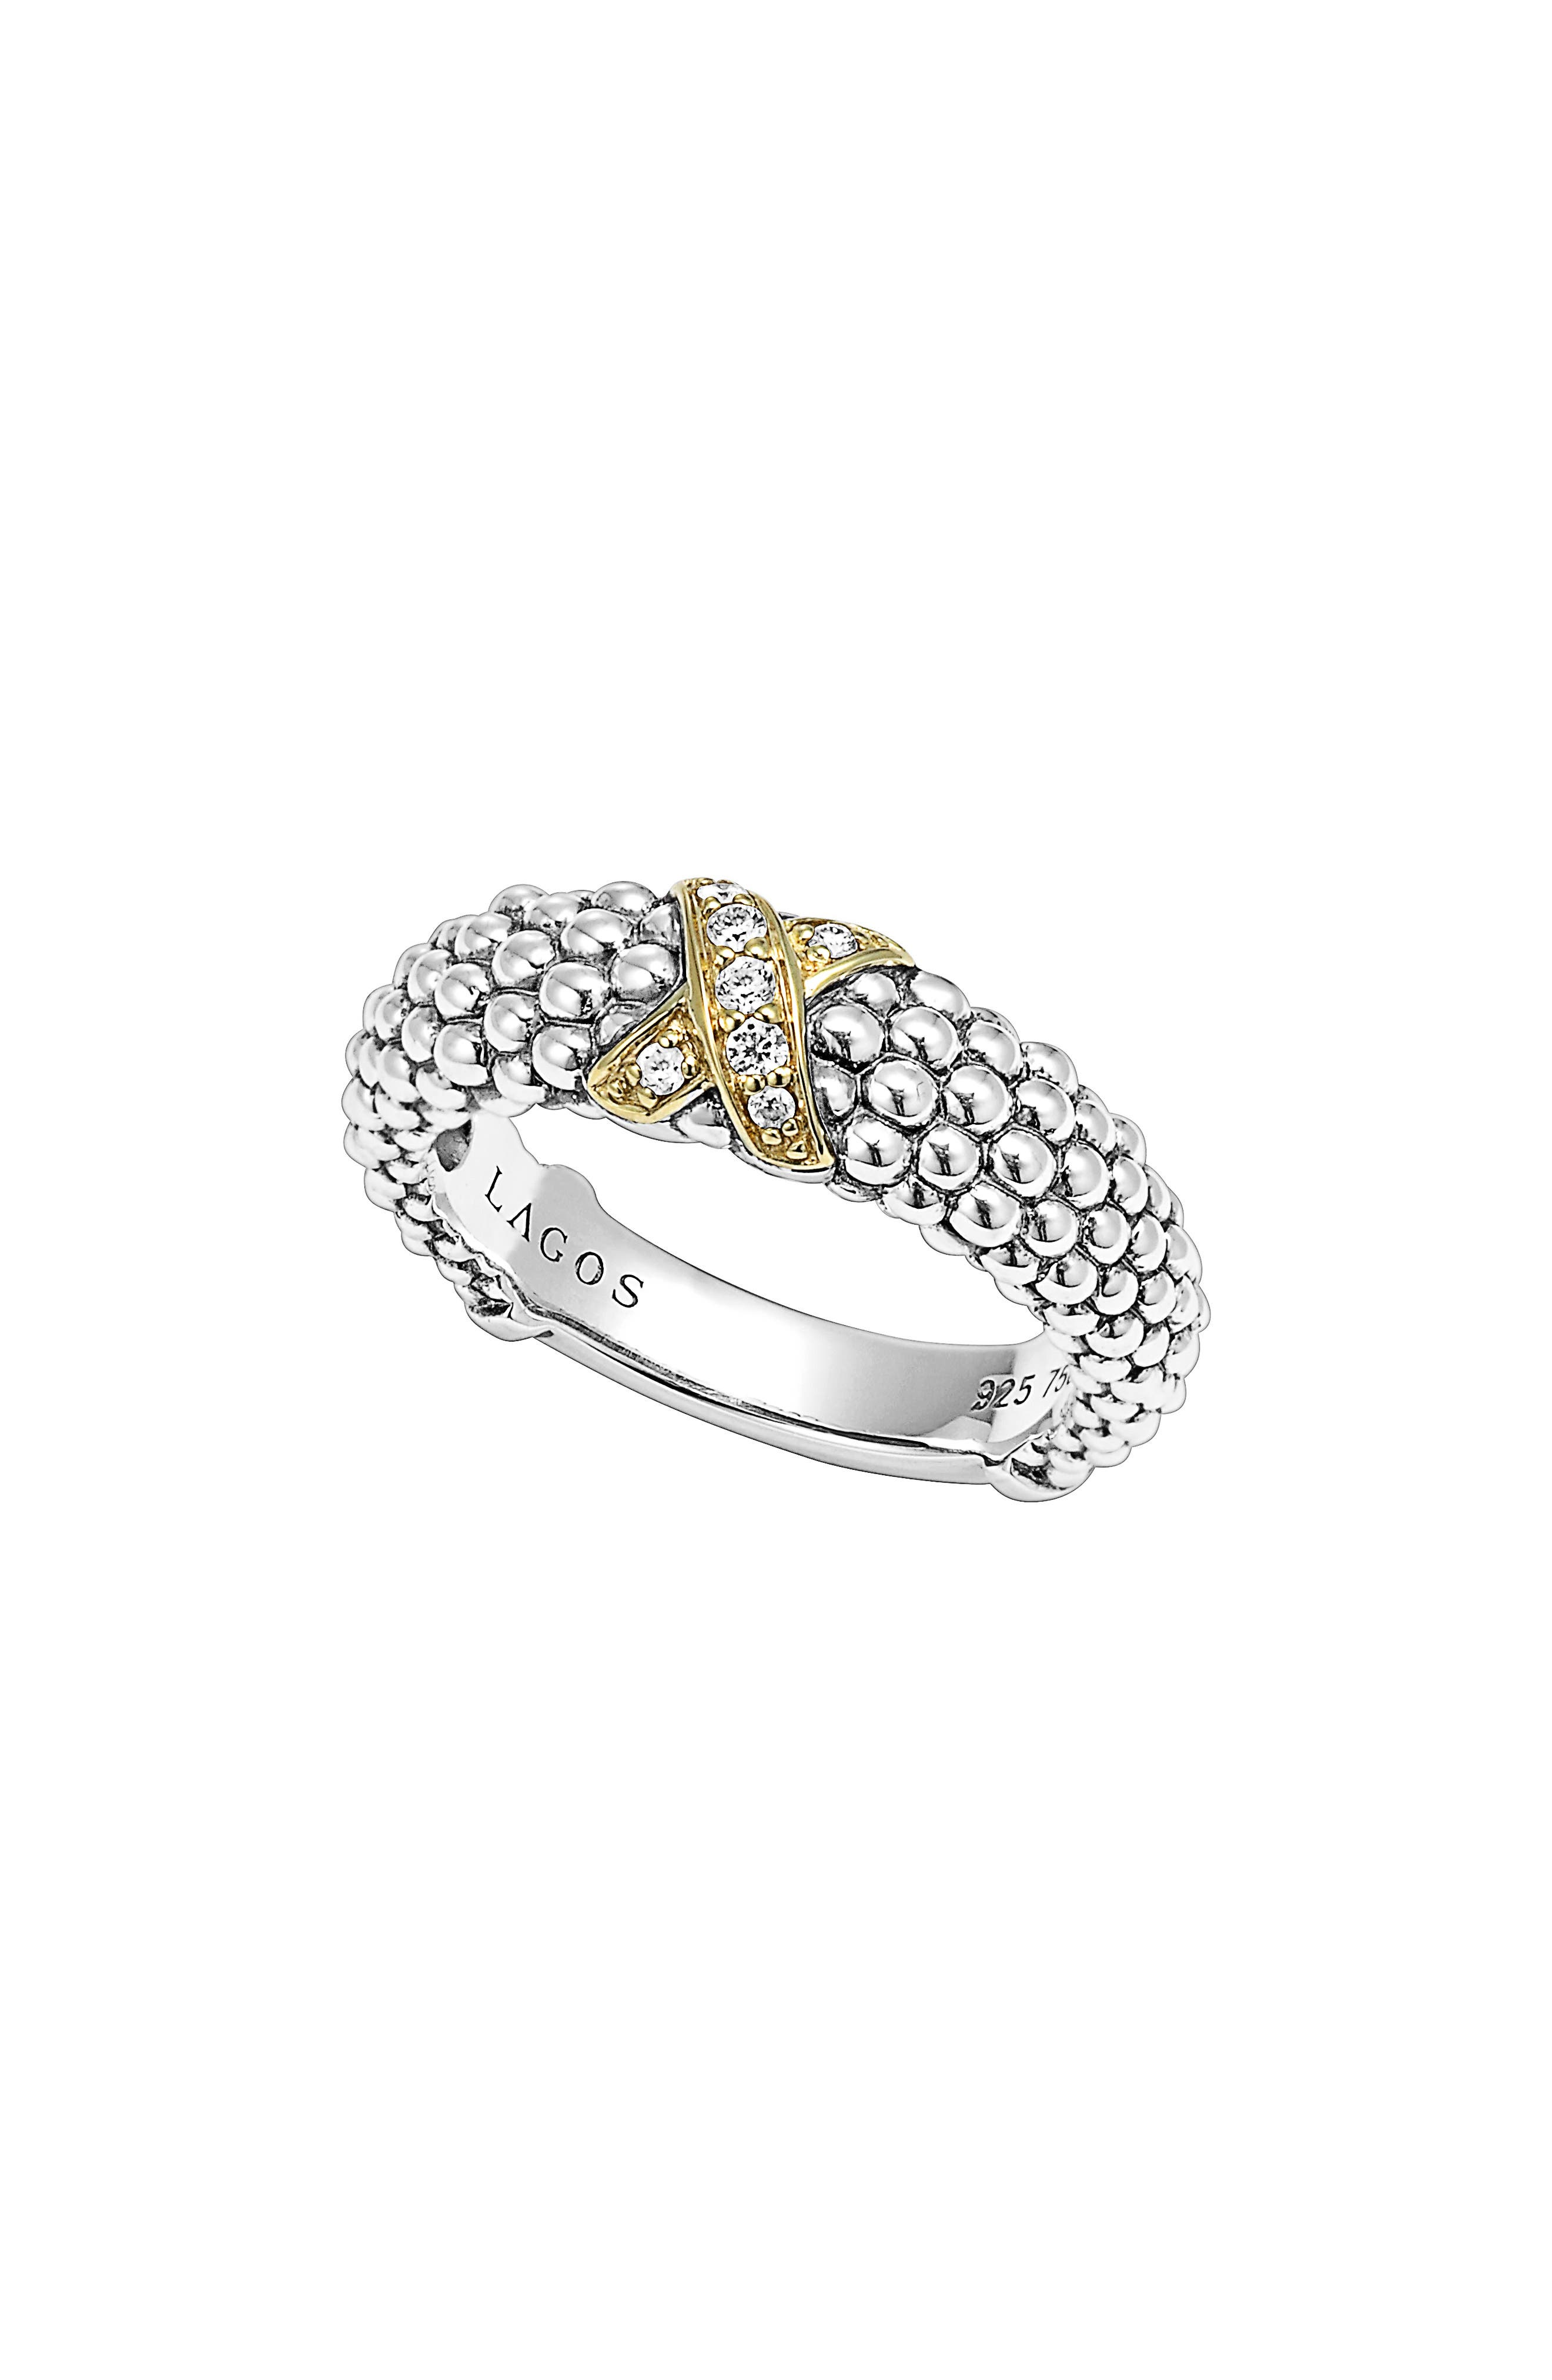 Alternate Image 1 Selected - LAGOS 'X' Diamond & Caviar™' Two Tone Ring